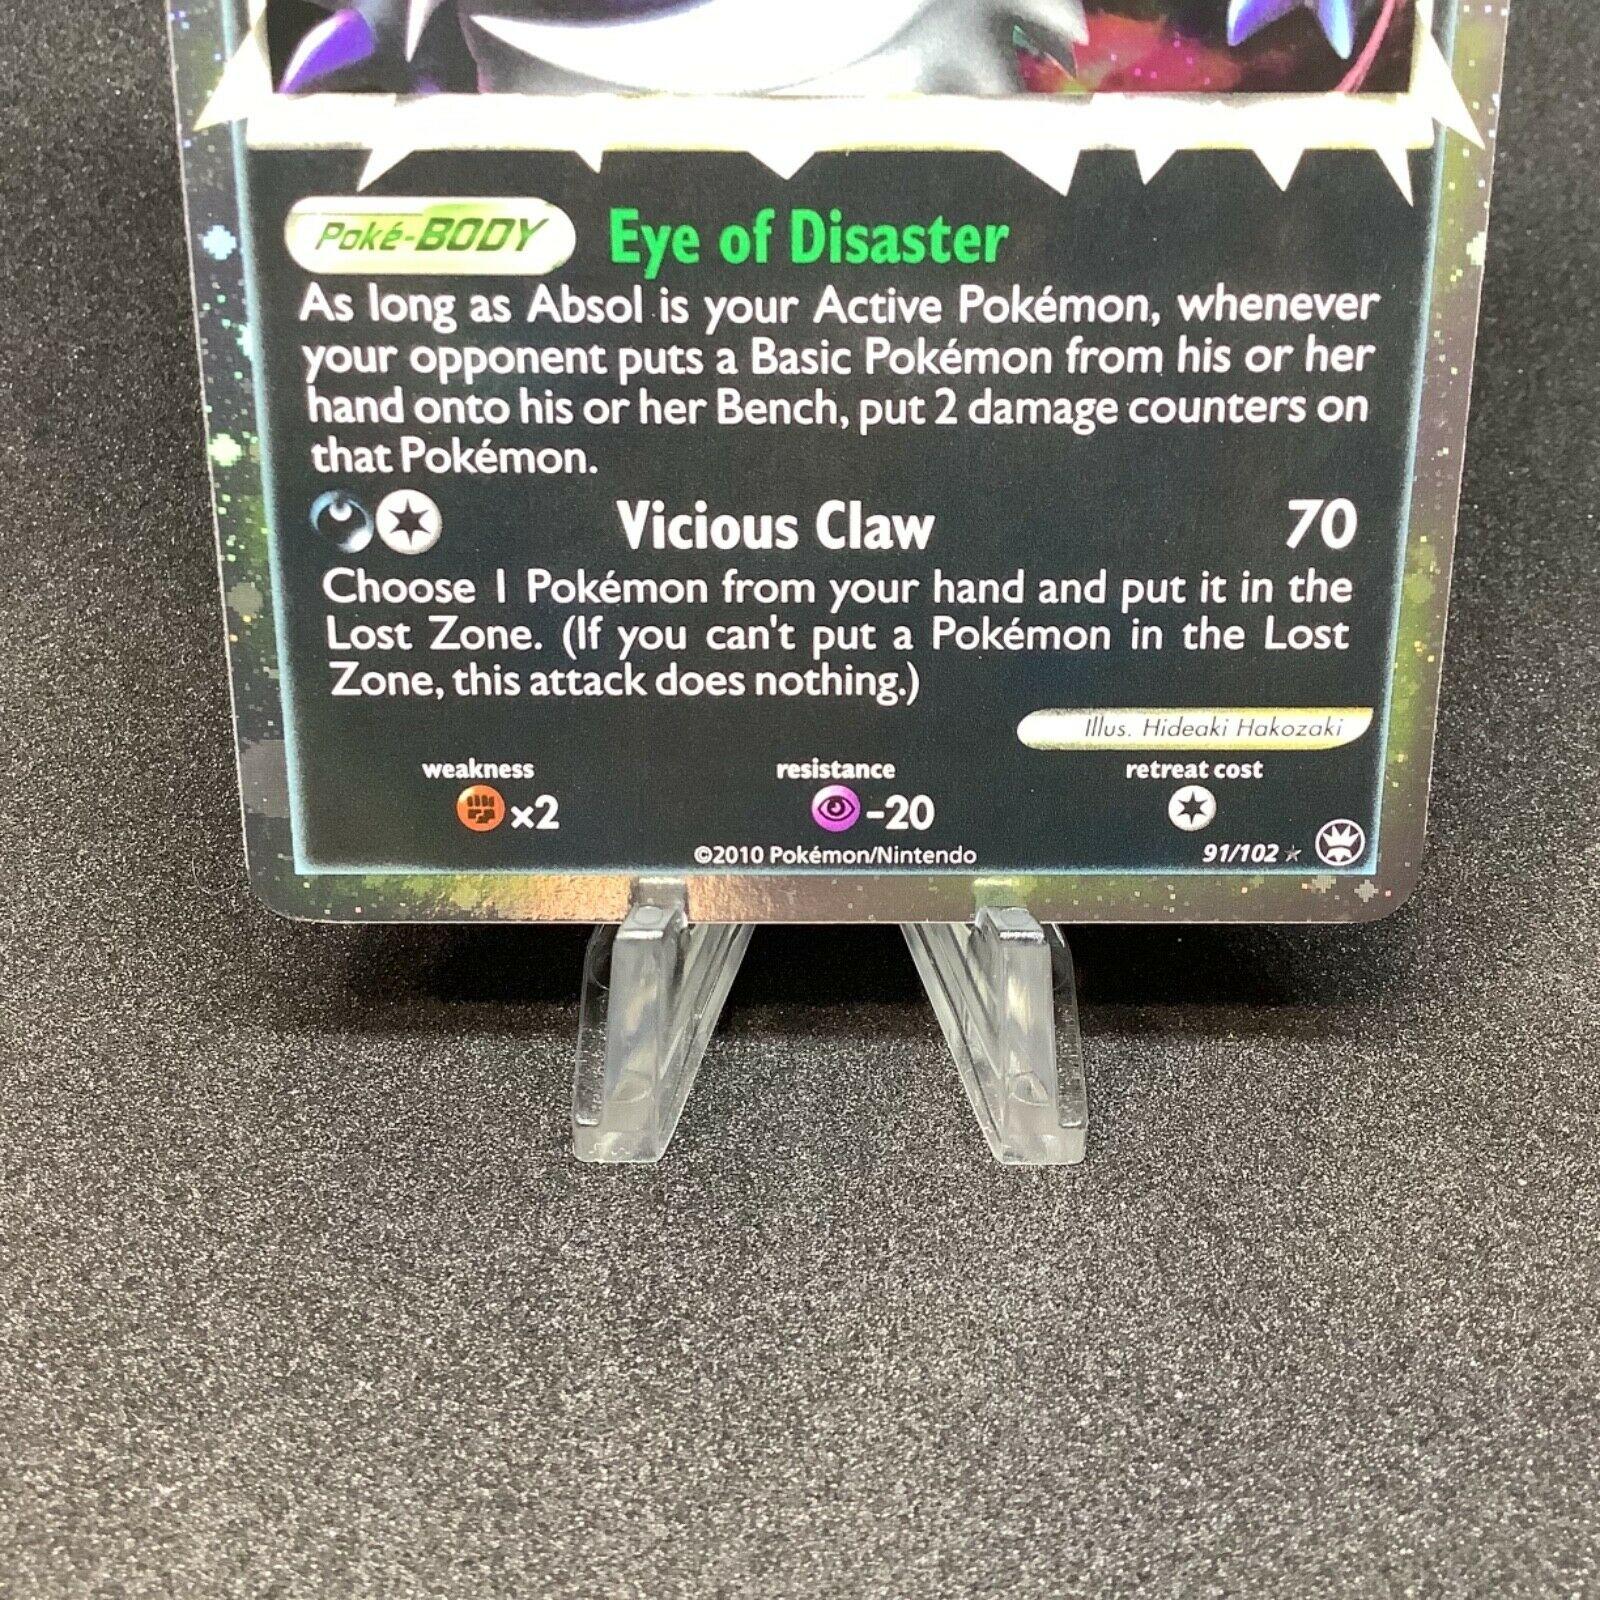 Absol Prime HGSS Triumphant 91/102 Holo Rare Pokemon Card NM - Image 3